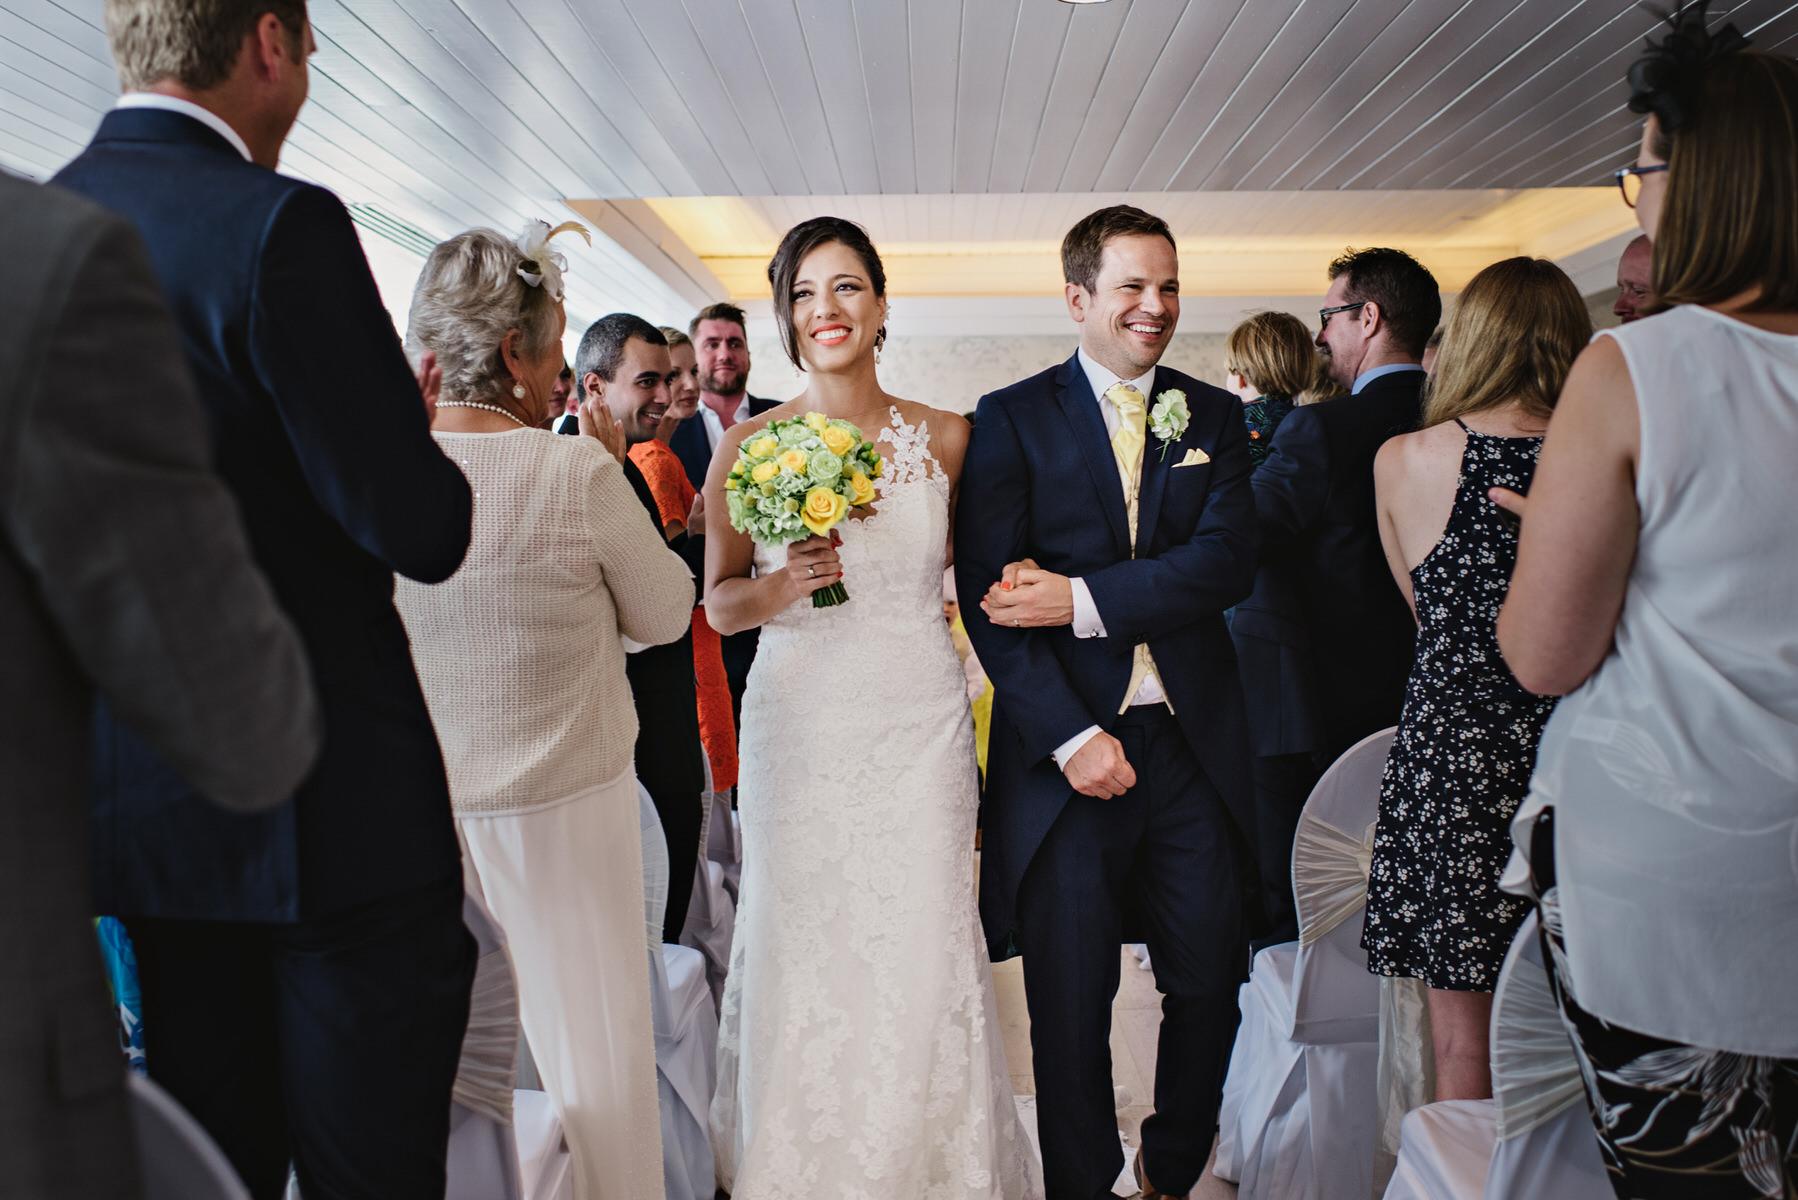 Ravens Ait wedding newly married